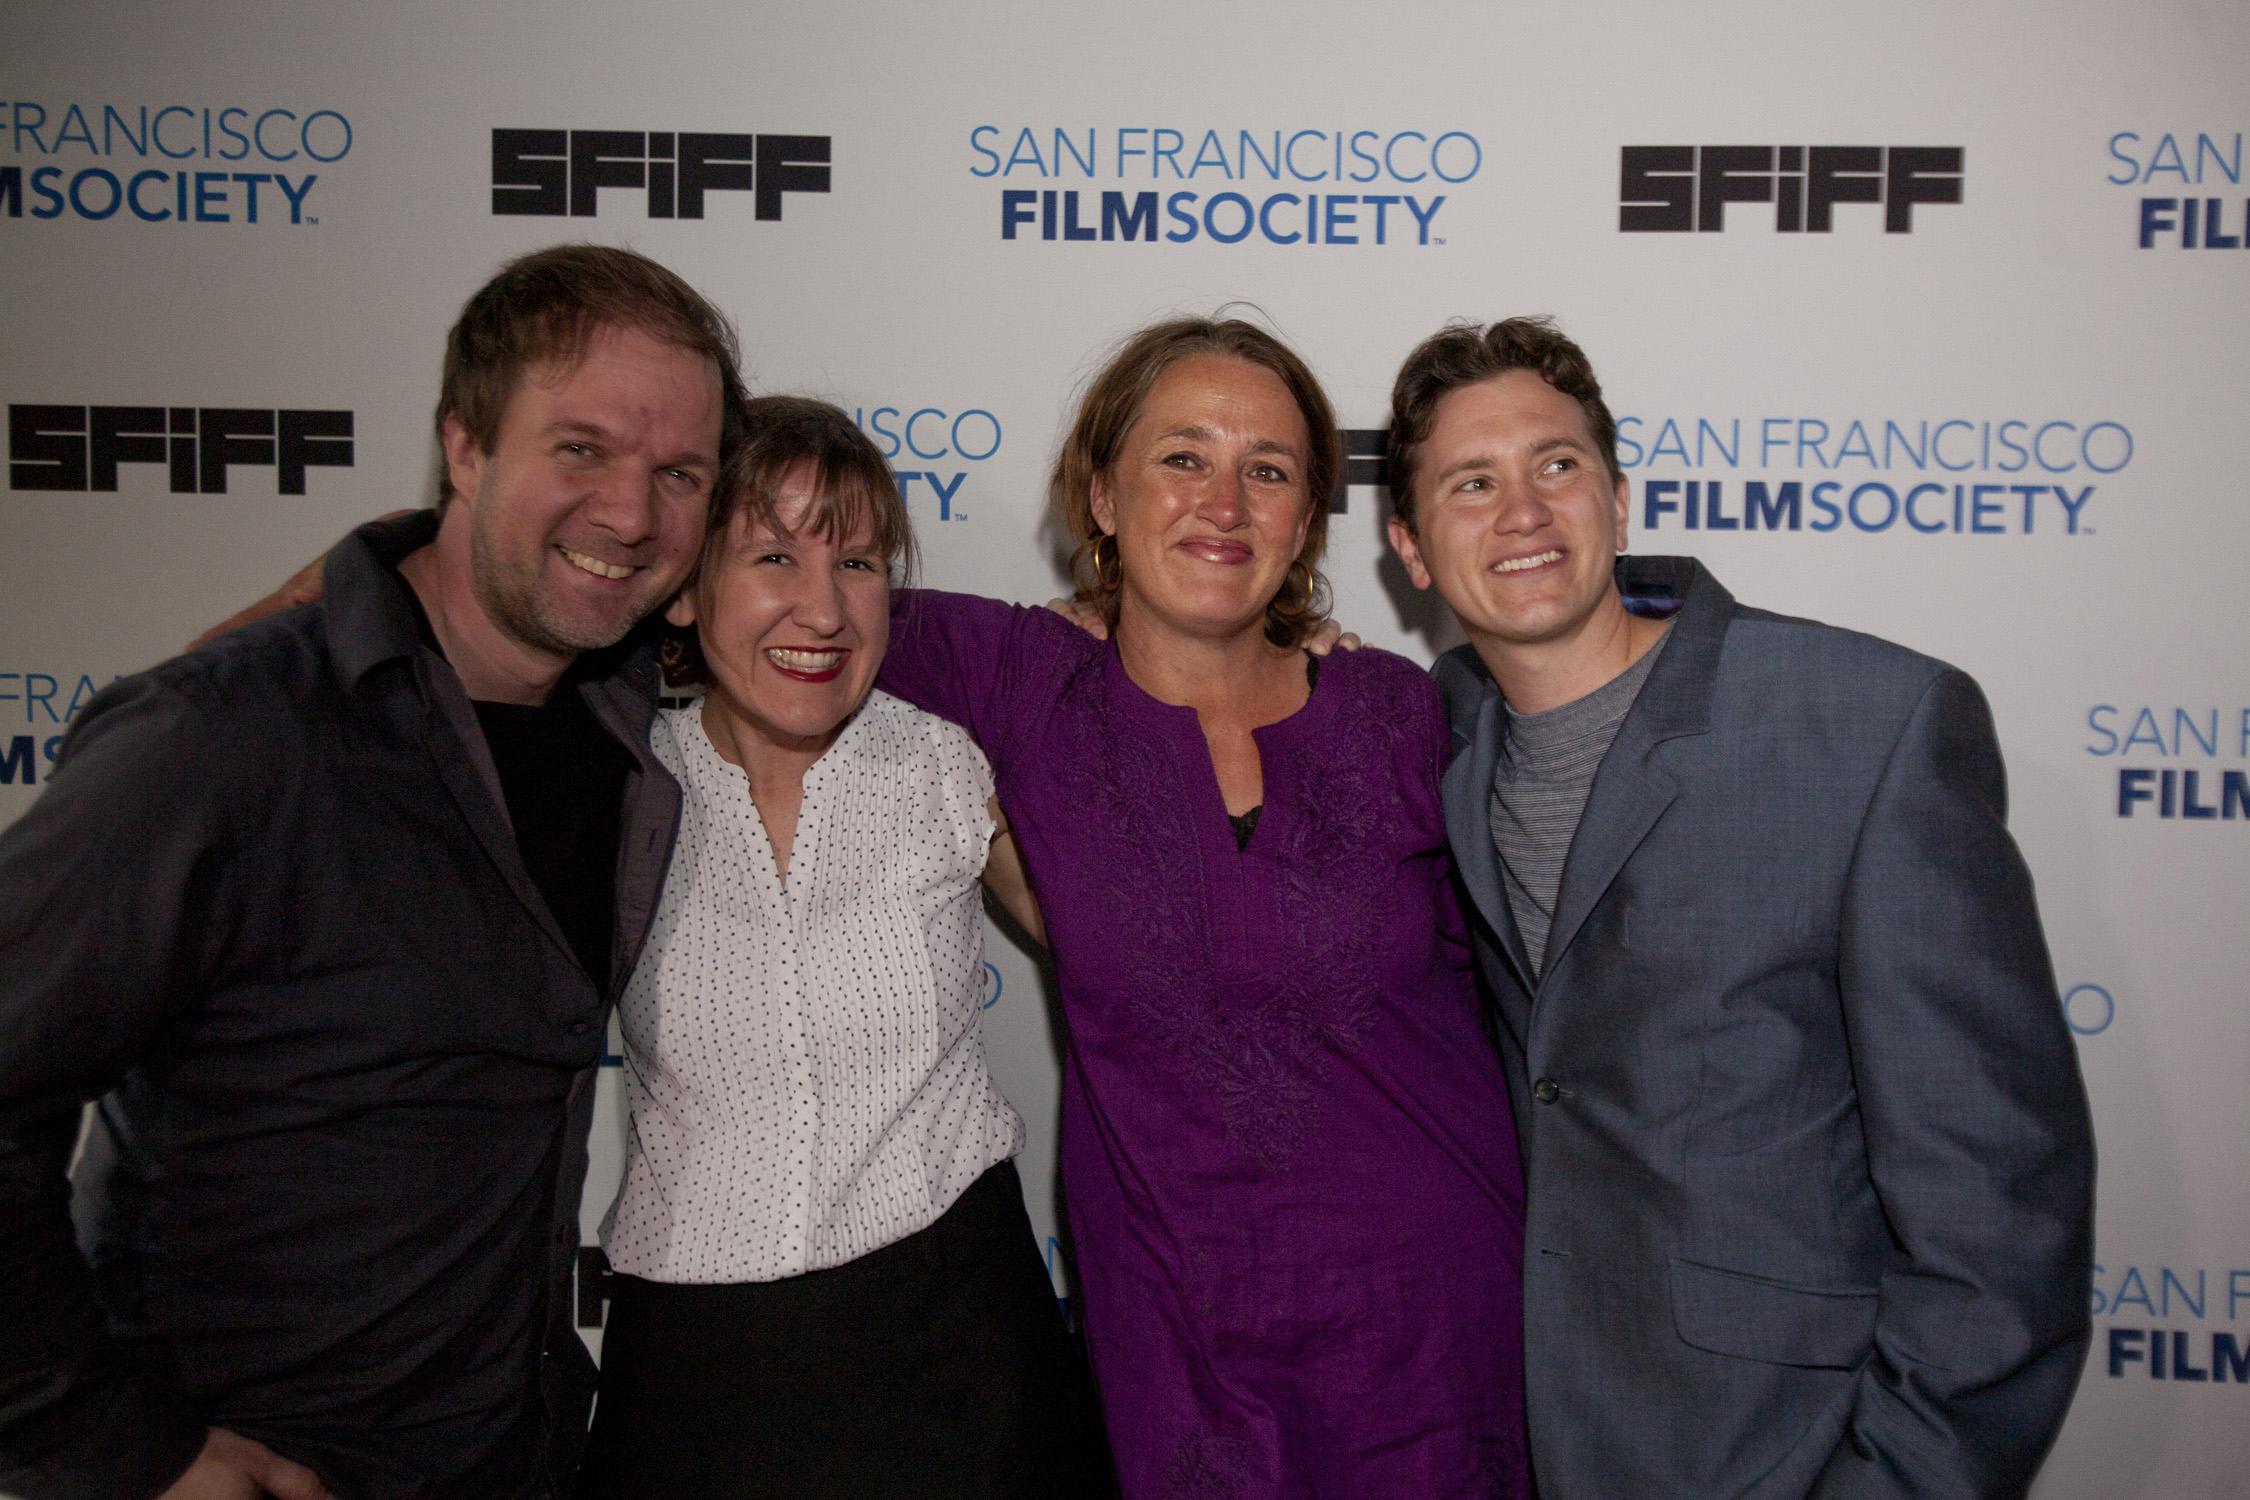 Pete Horner, Director Kat Candler, Filmmaker 360 Director Michele Turnure-Salleo and Producer Jonathan Duffy